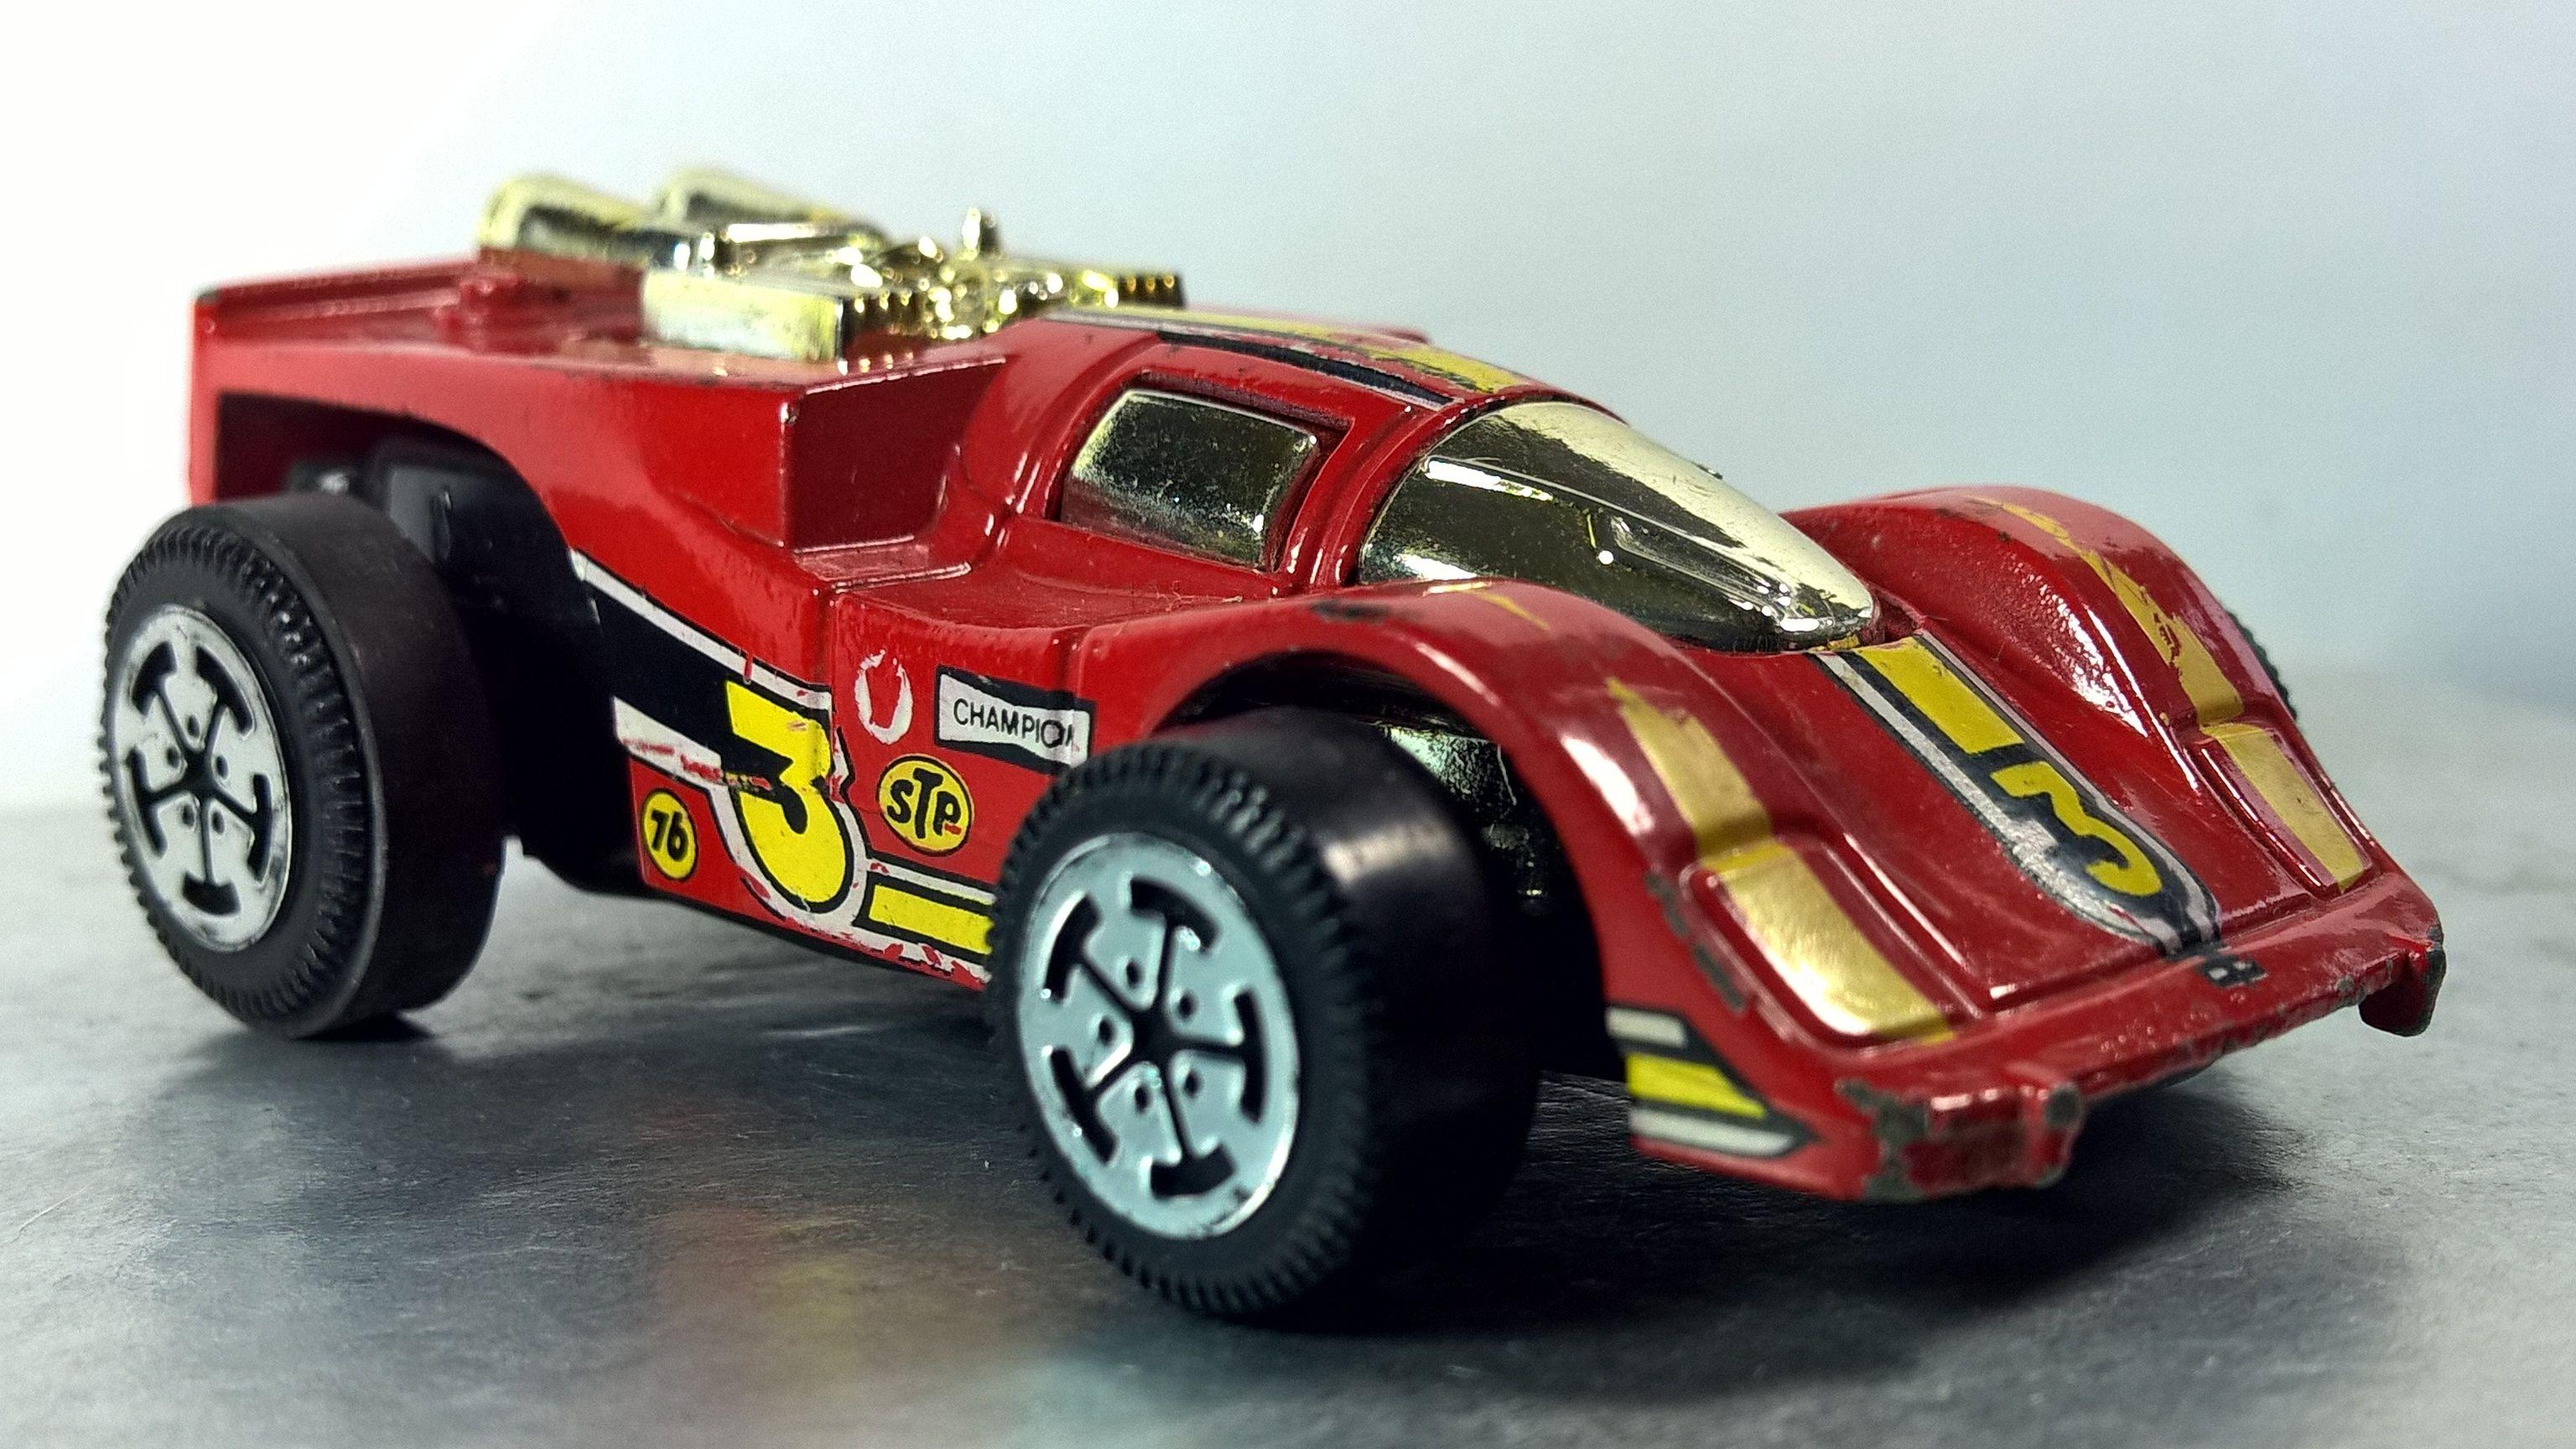 XV RACERS 1985 17 Hot wheels, Car photos, Toy car